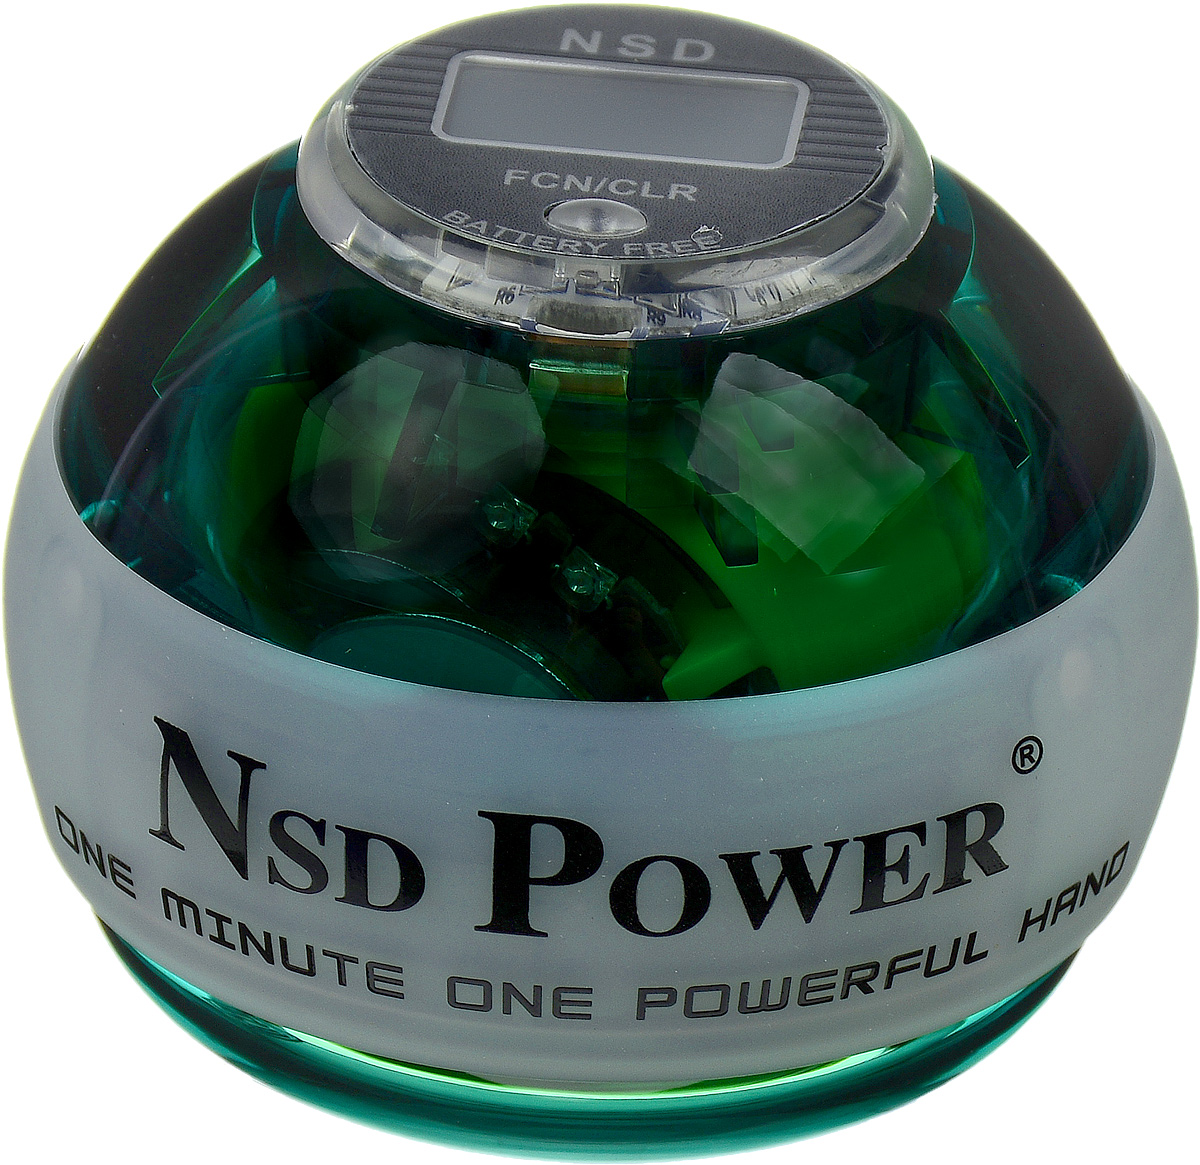 Тренажер кистевой NSD Power Powerball Neon Pro, цвет: зеленый тренажер кистевой powerball 250 hz neon pb 688l green